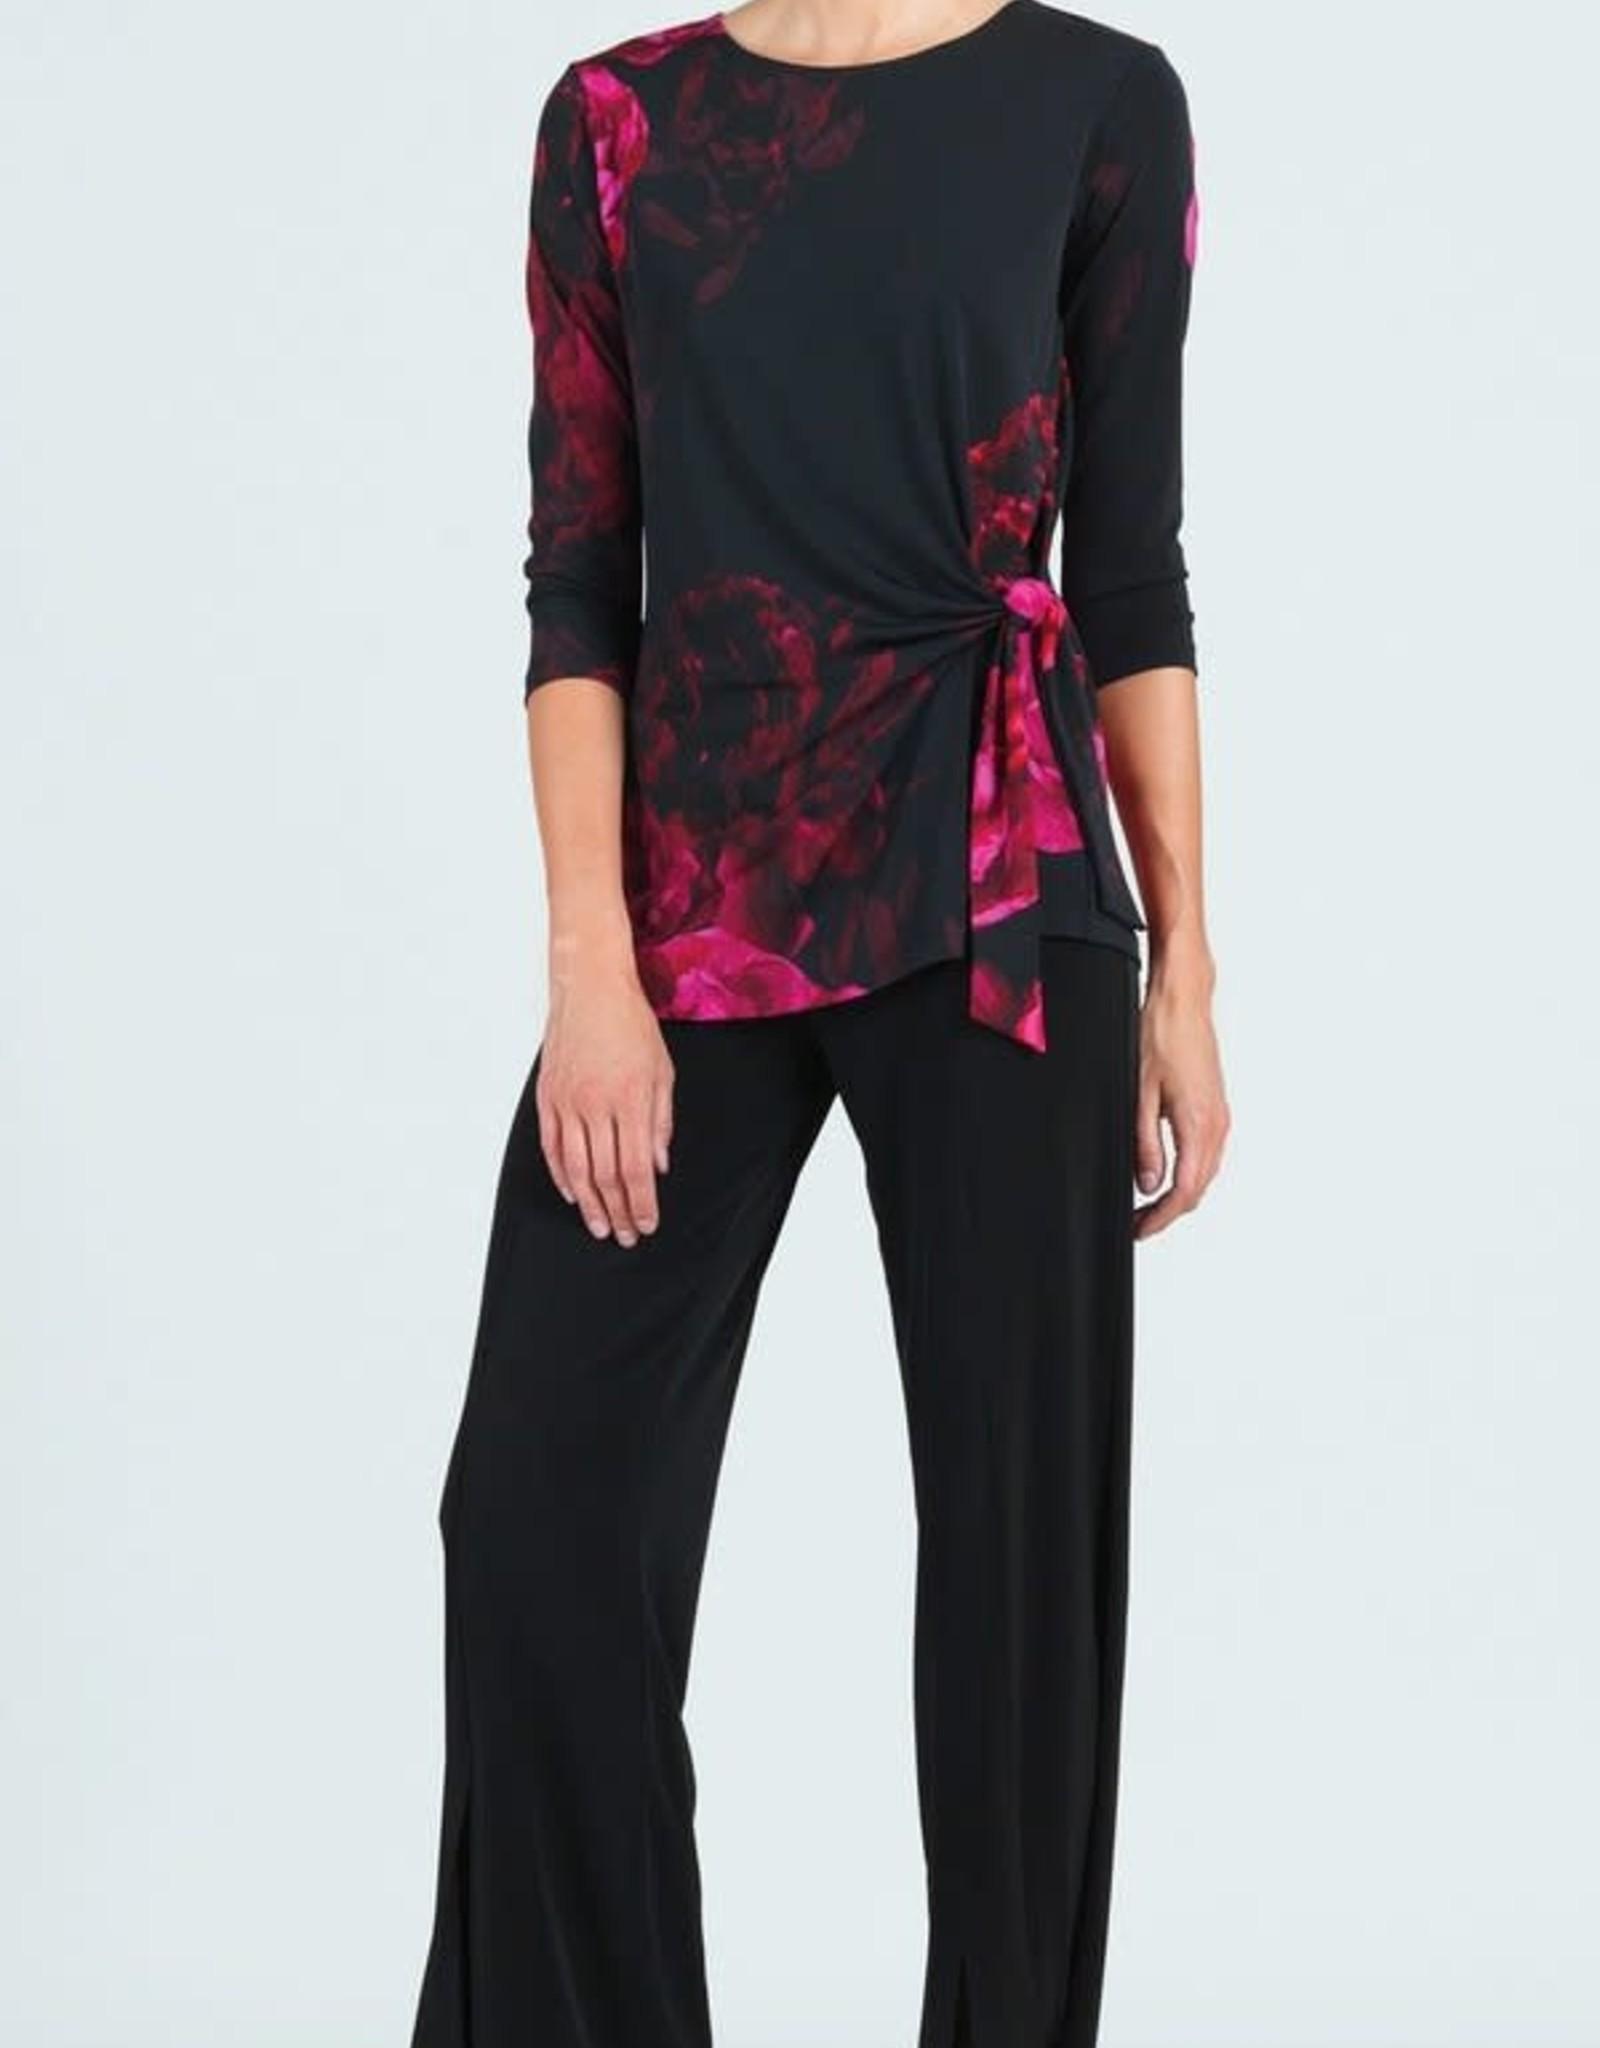 - Peony Print 3/4 Sleeve Tunic w/Side Tie